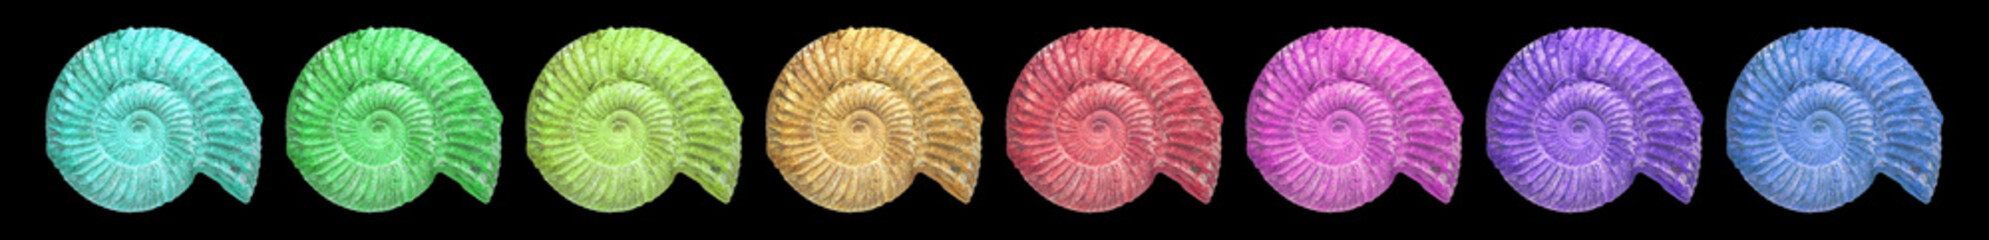 Aluminium Prints Spiral Ammonit